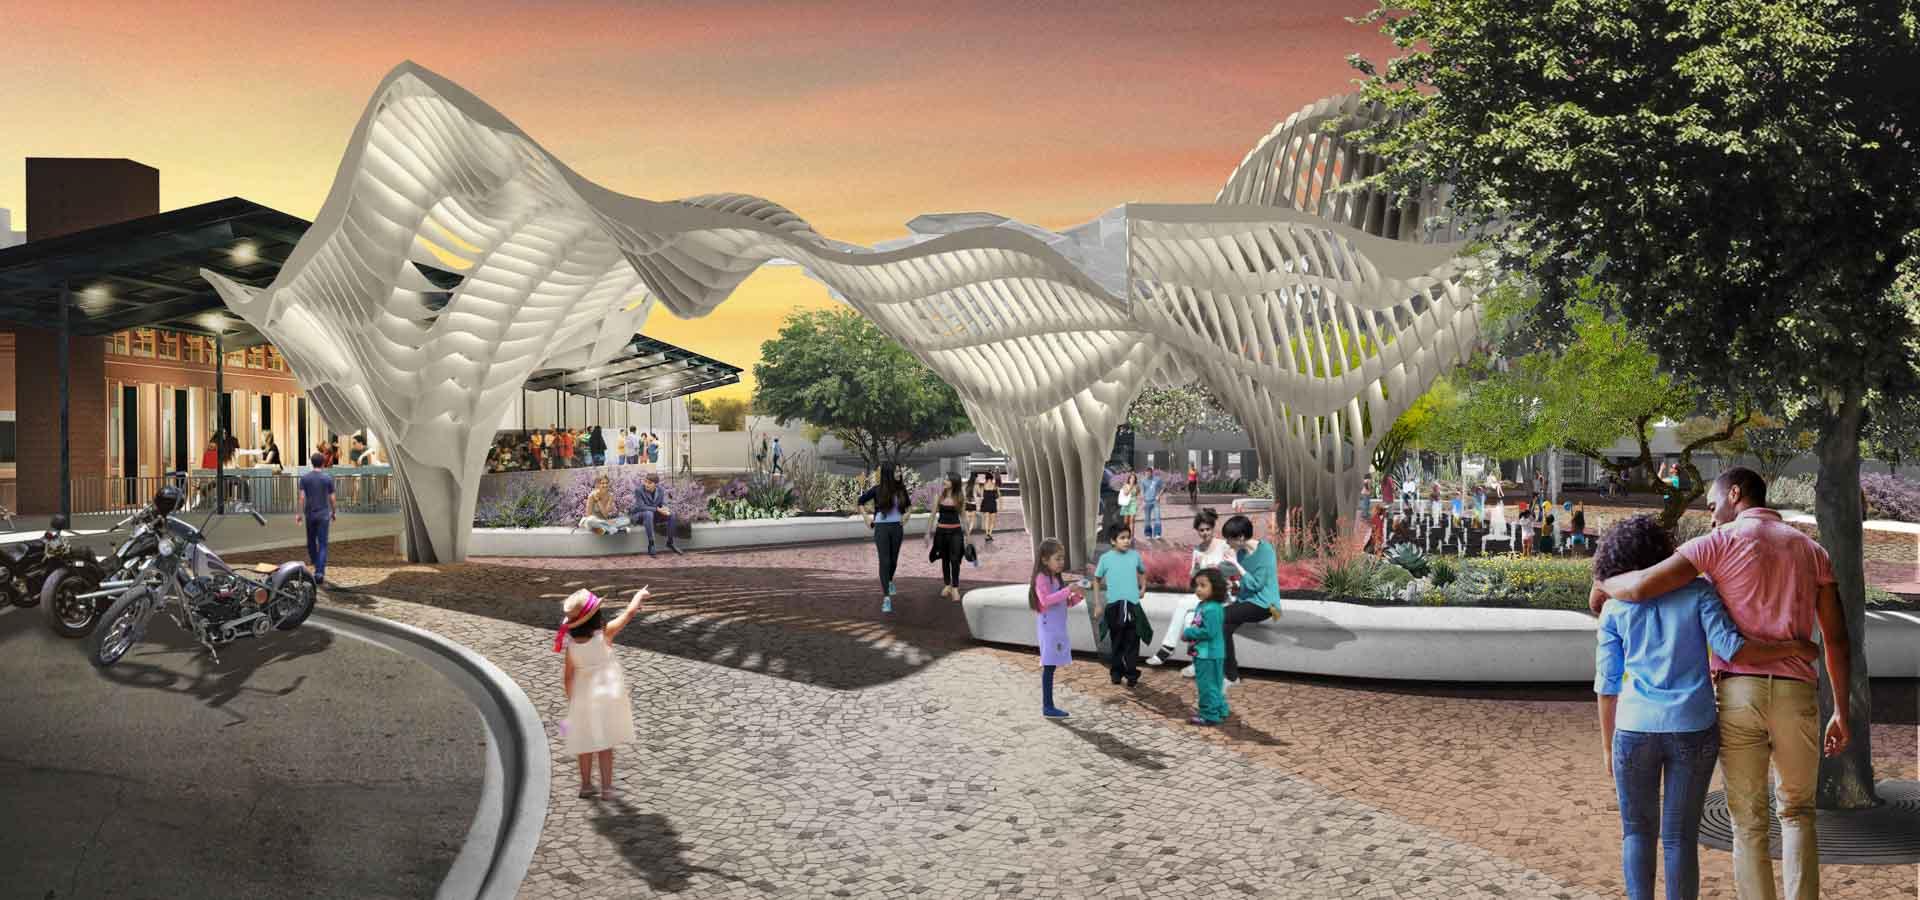 landscape-architecture-urban-design-hance-park-2.jpg